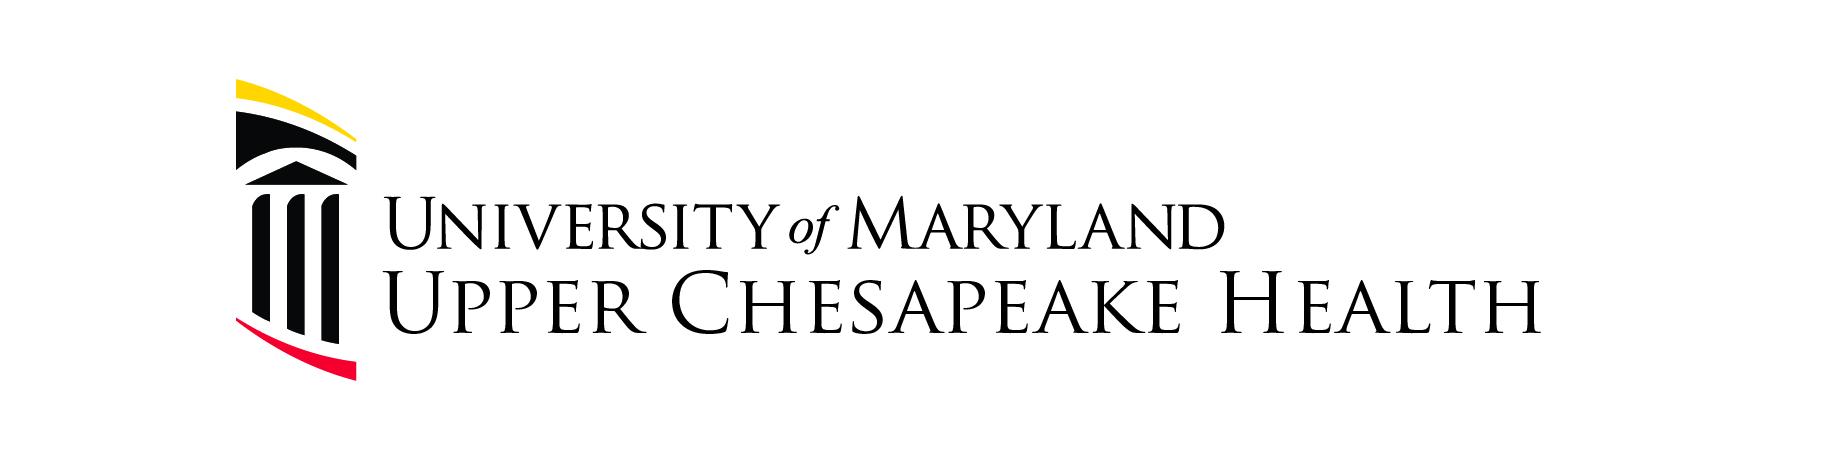 University Of Maryland Upper Chesapeake Health Announces